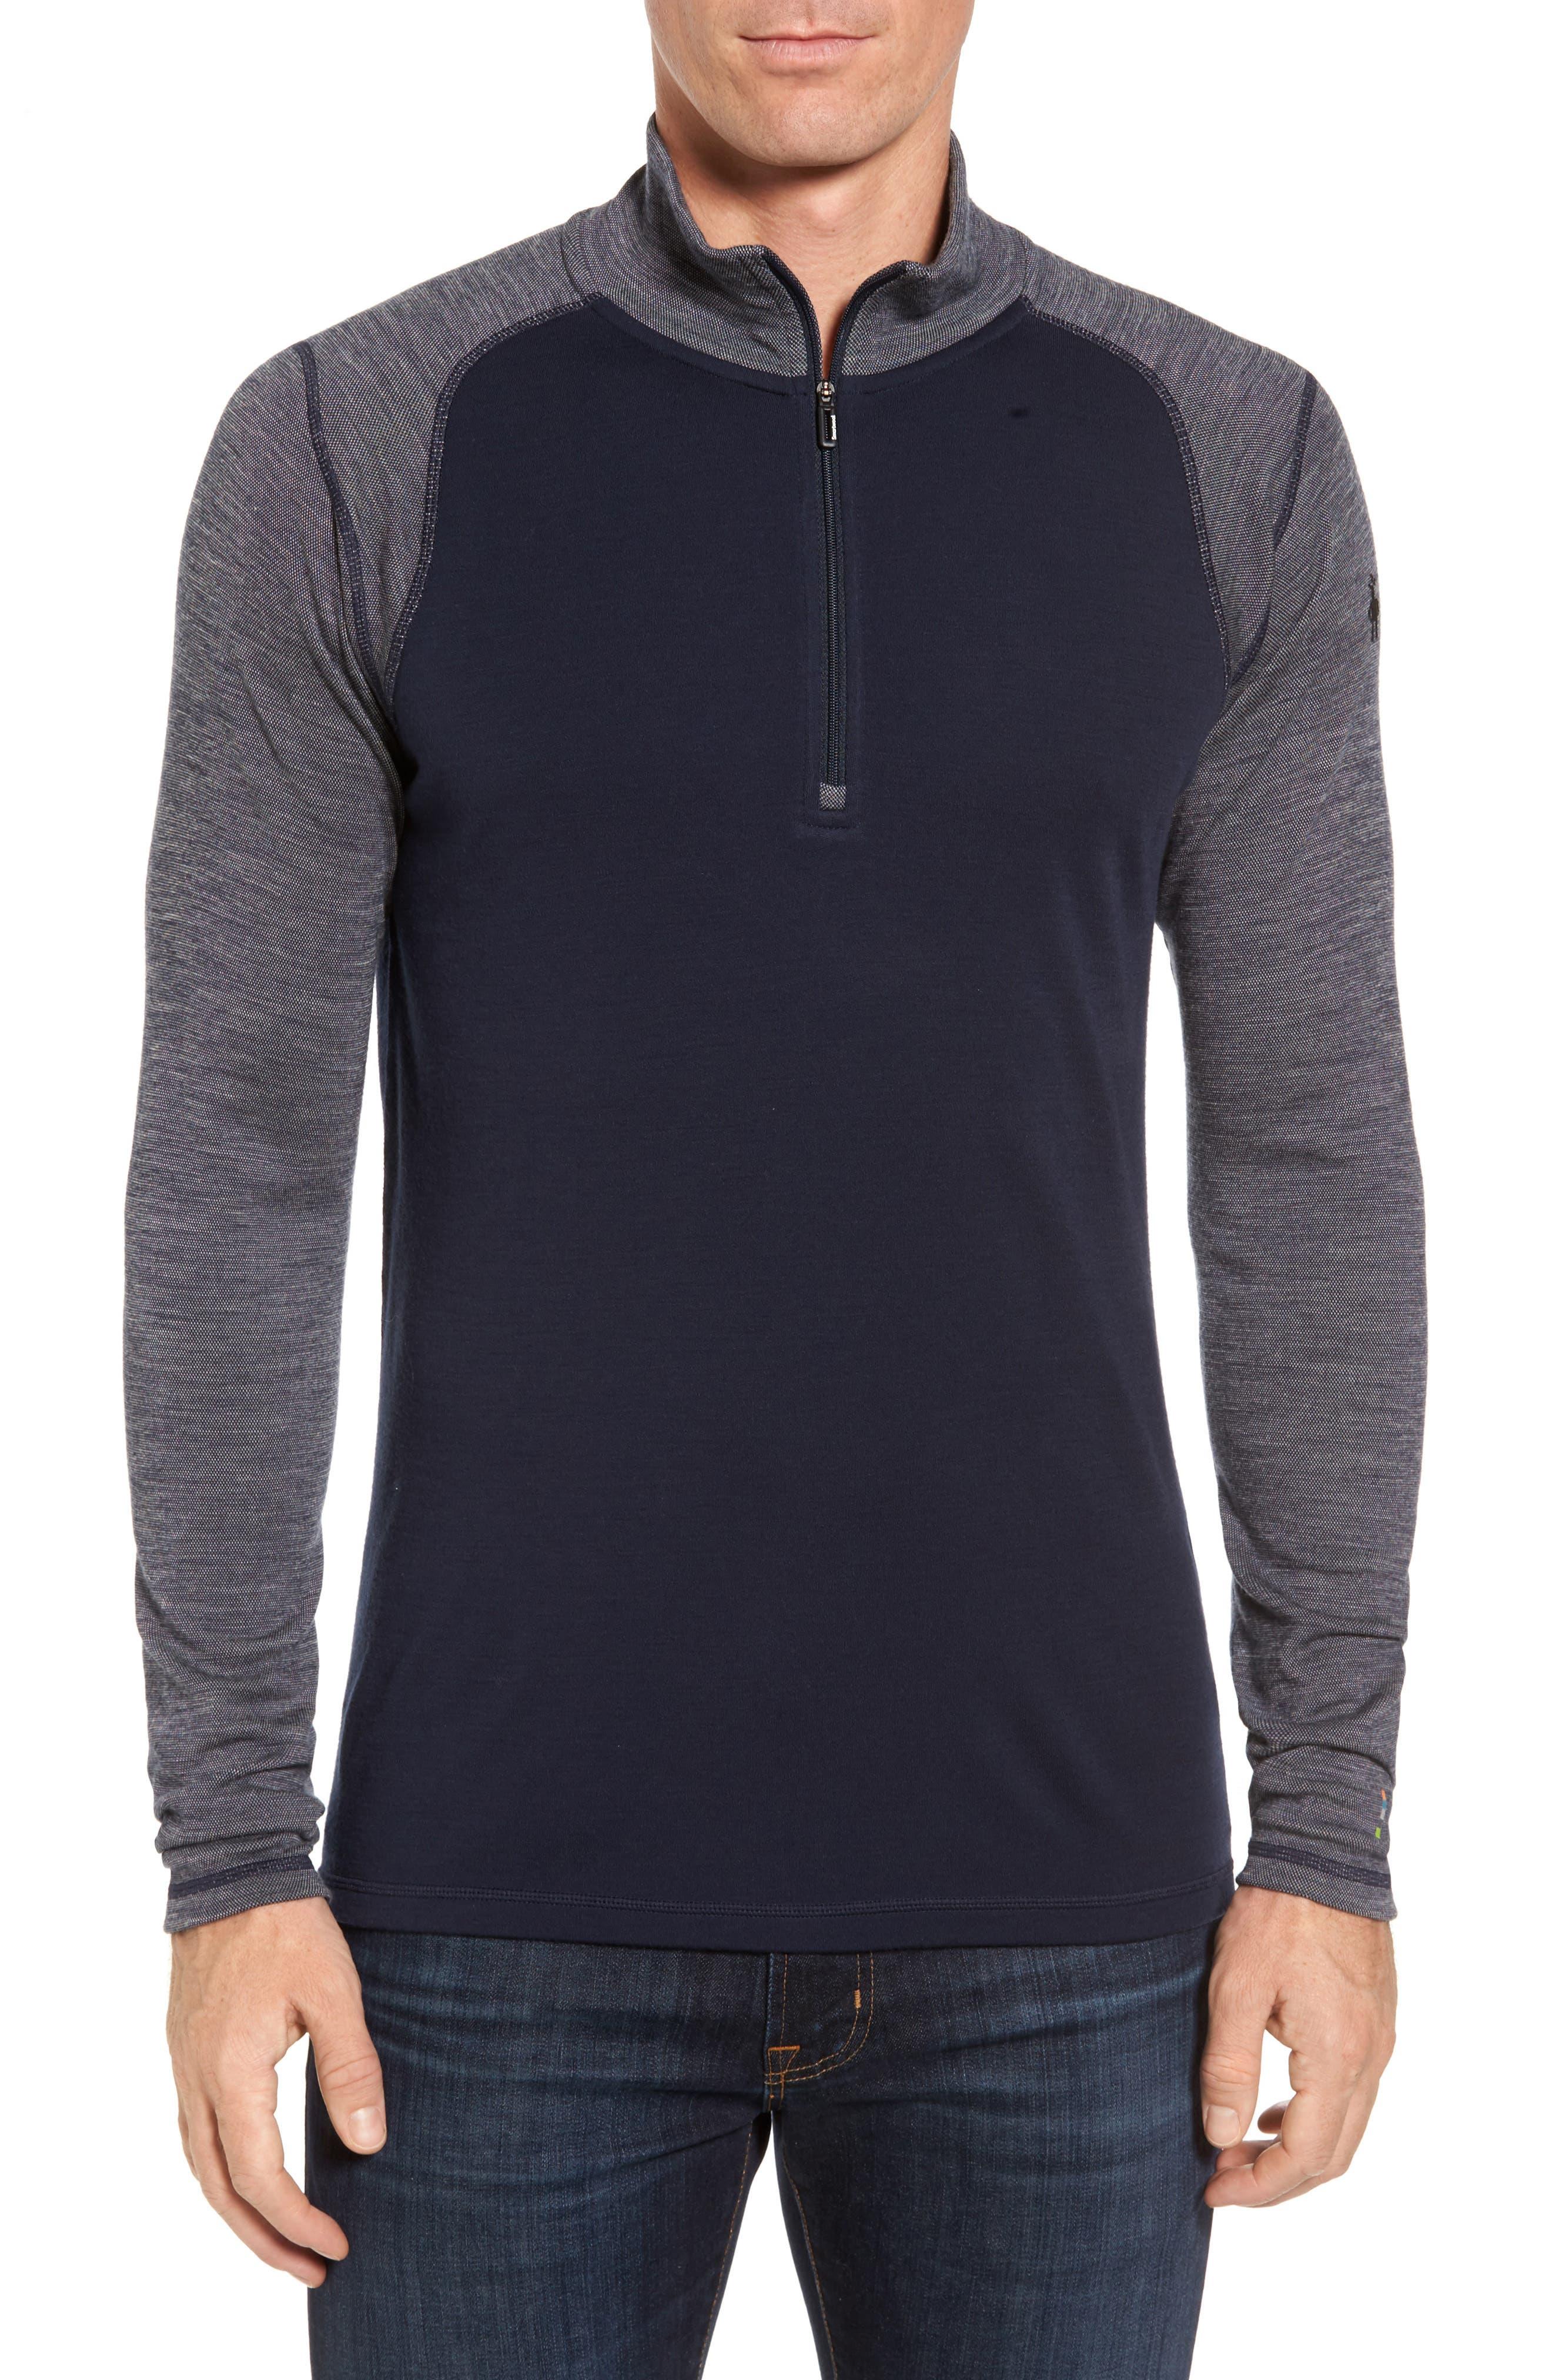 Merino 250 Base Layer Pattern Quarter Zip Pullover,                         Main,                         color, Deep Navy/ Winter White